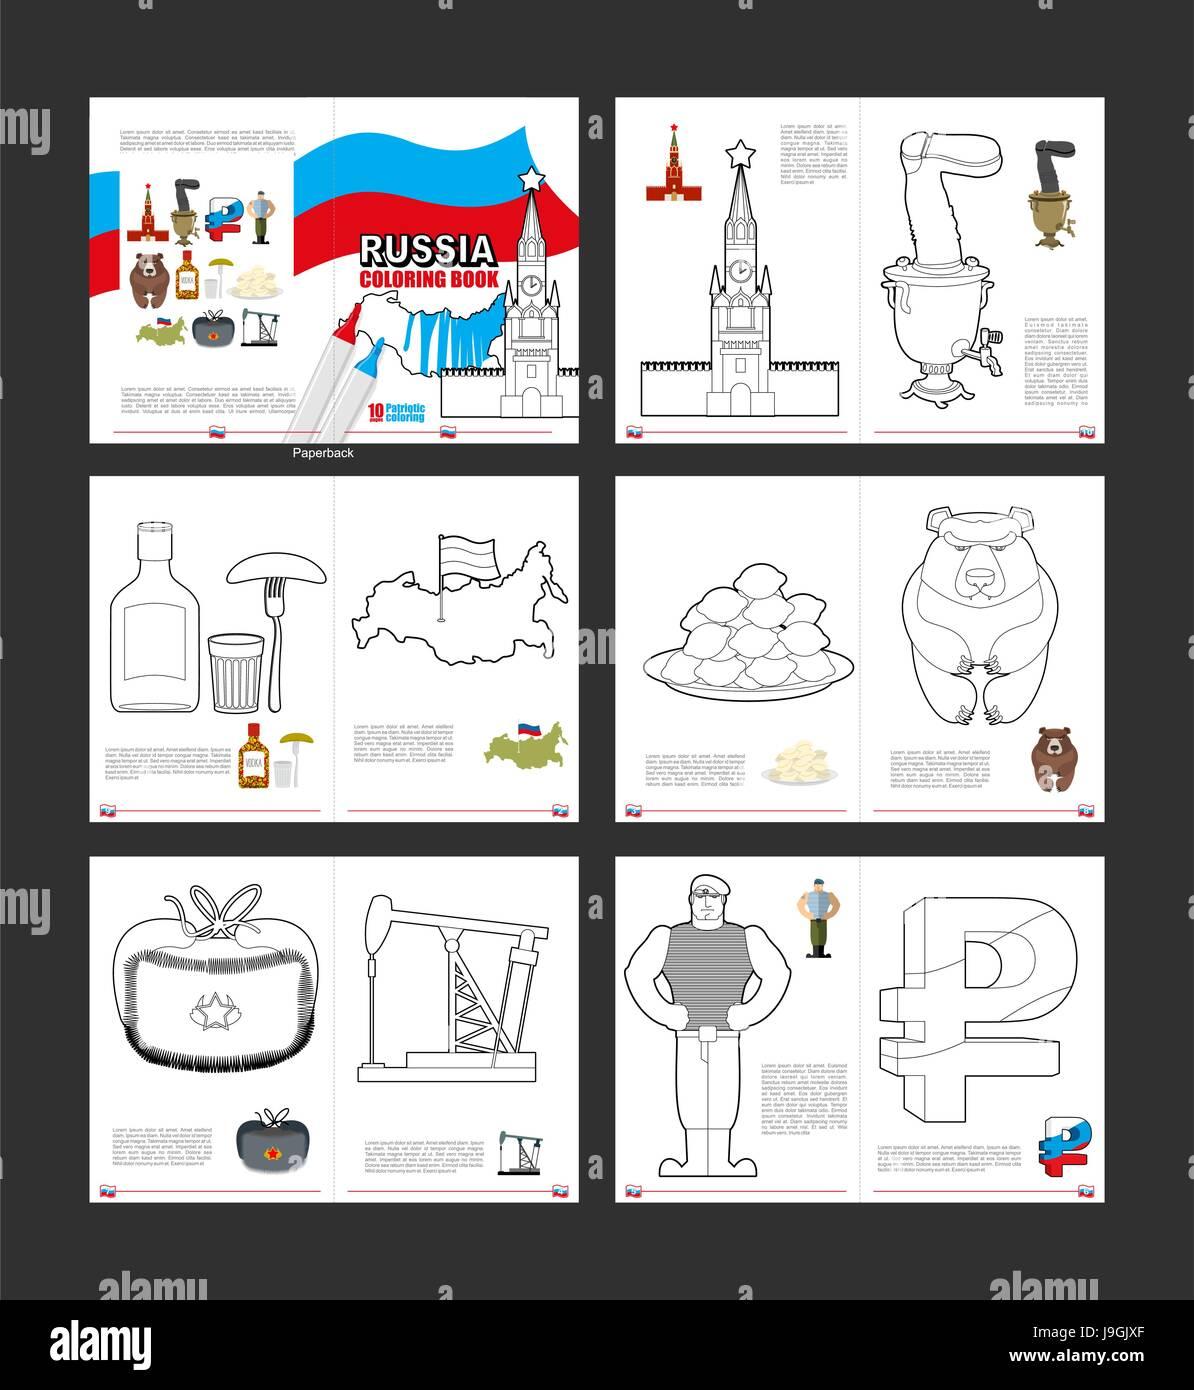 russia coloring book patriotic book for coloring russian